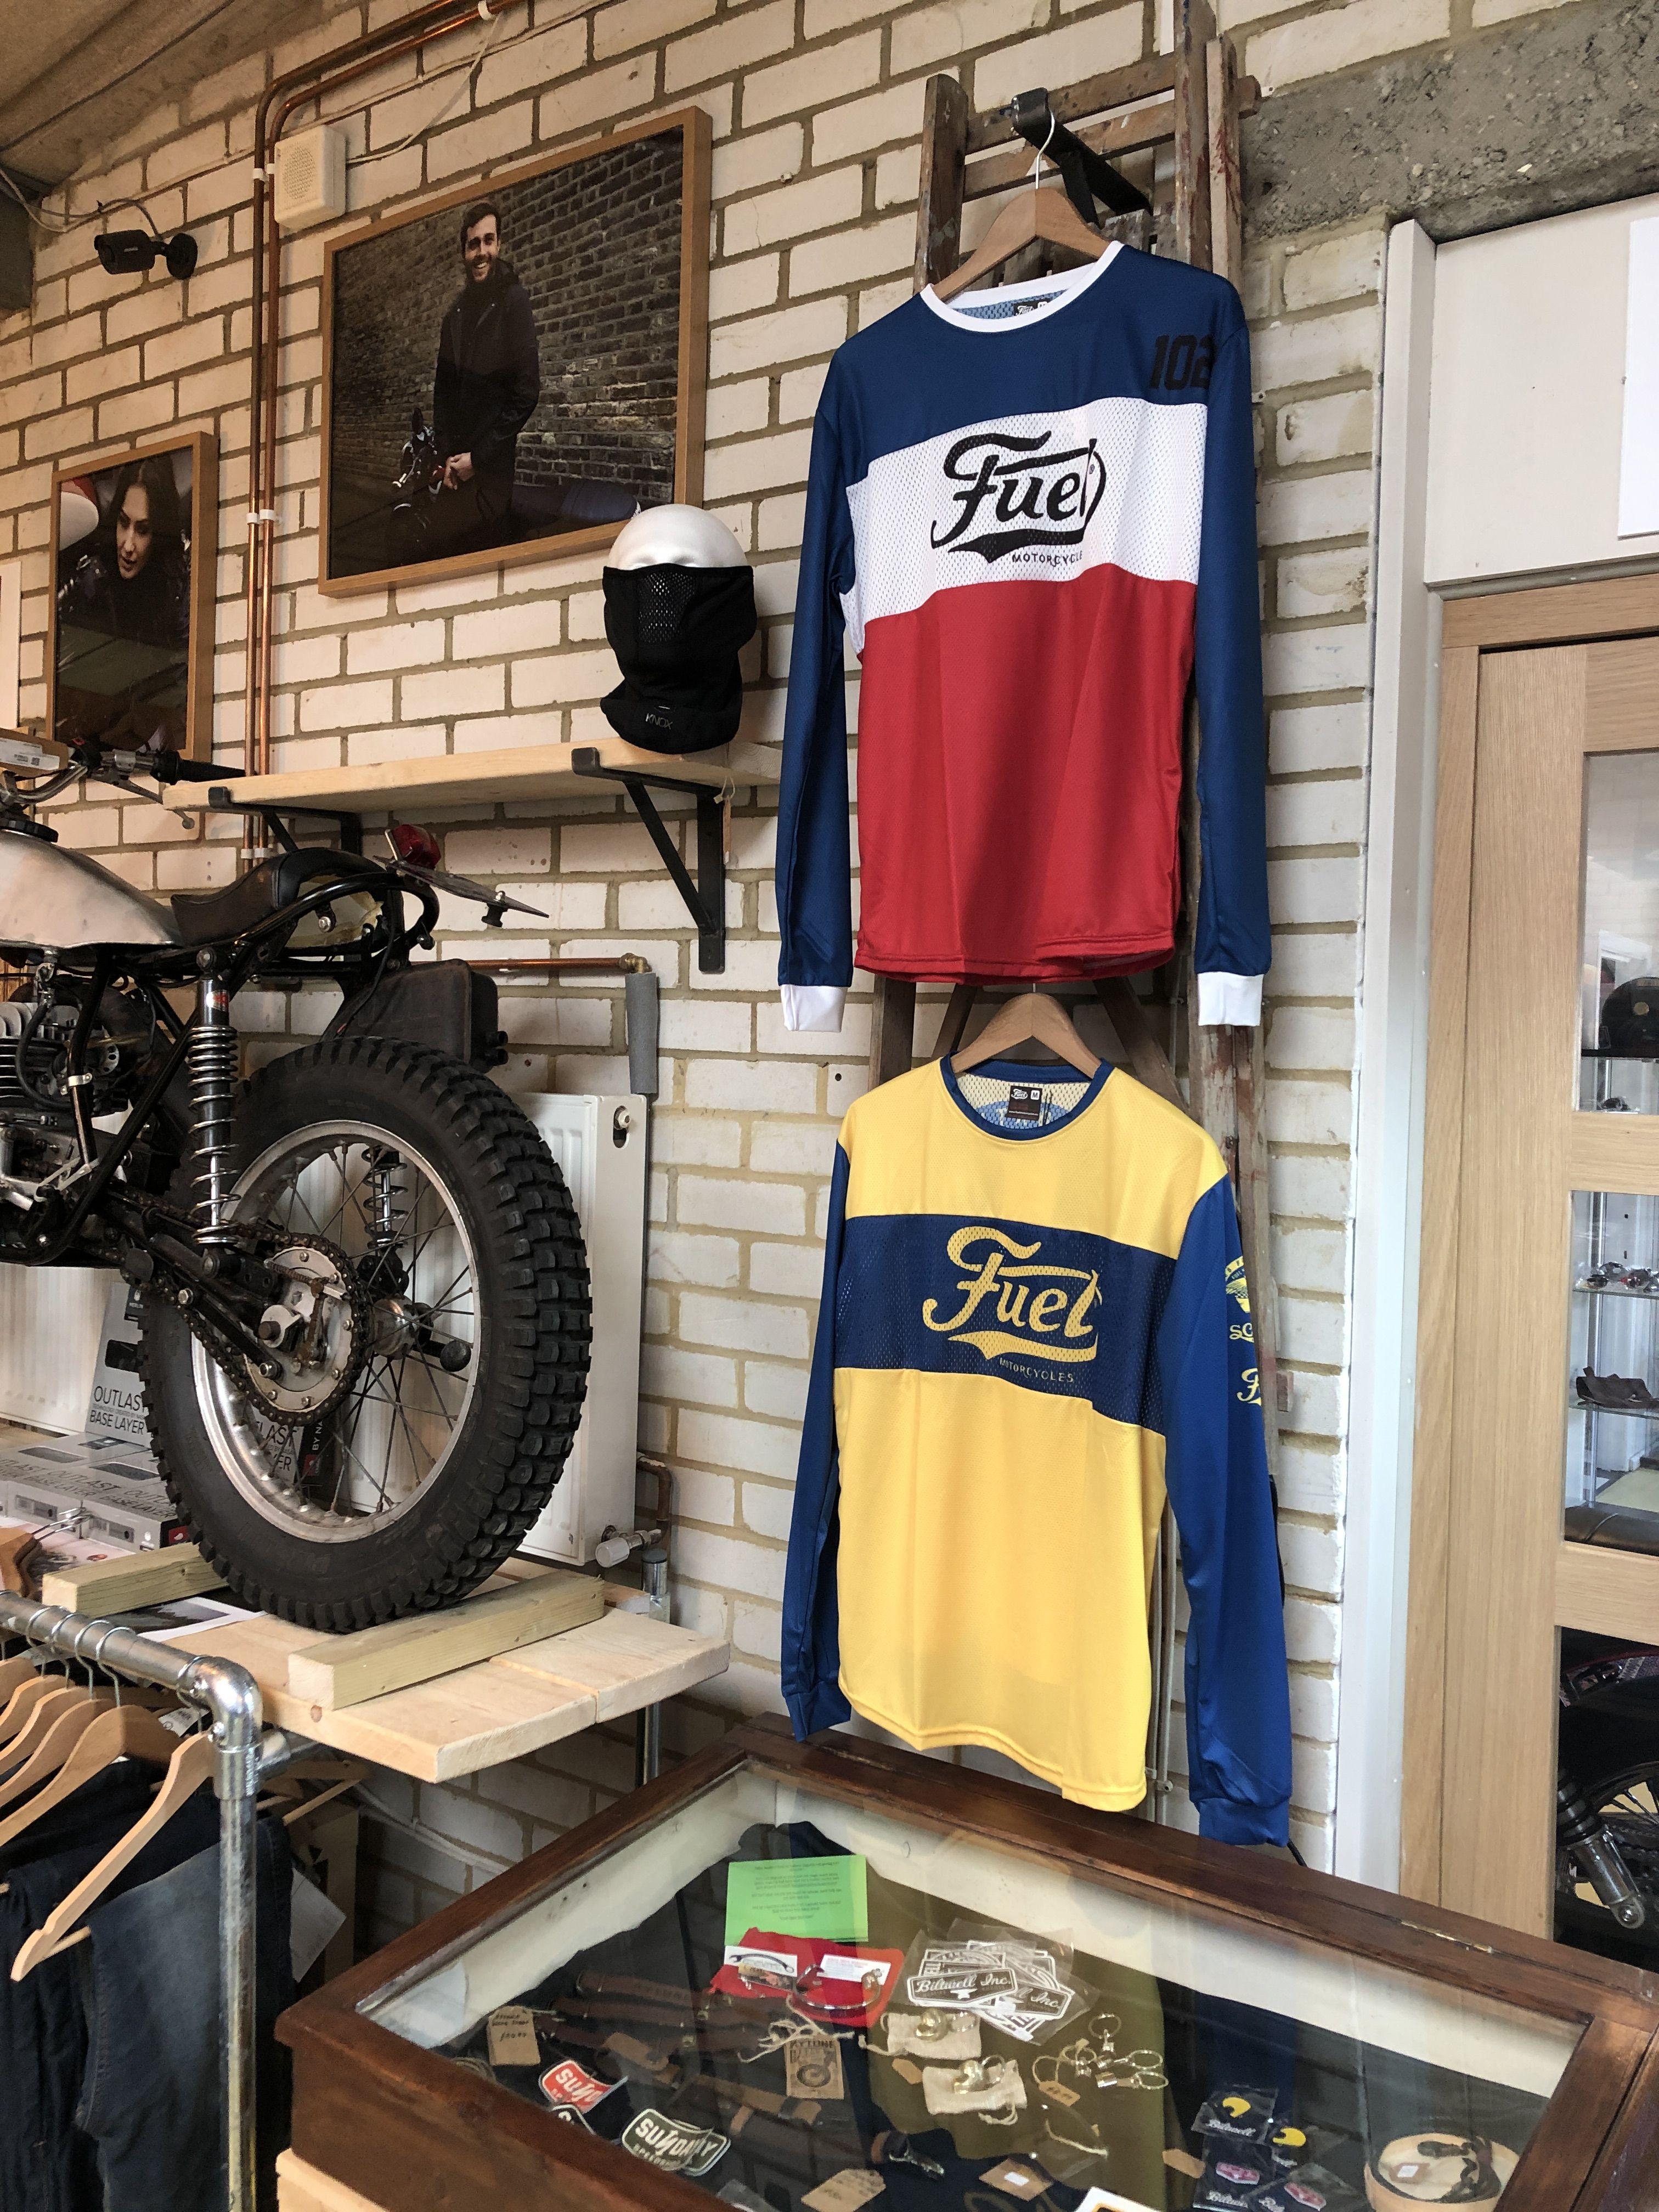 Download Fuel 102 Enduro Jersey Legacy85 Jersey Clothing Mockup Cafe Racer Bikes